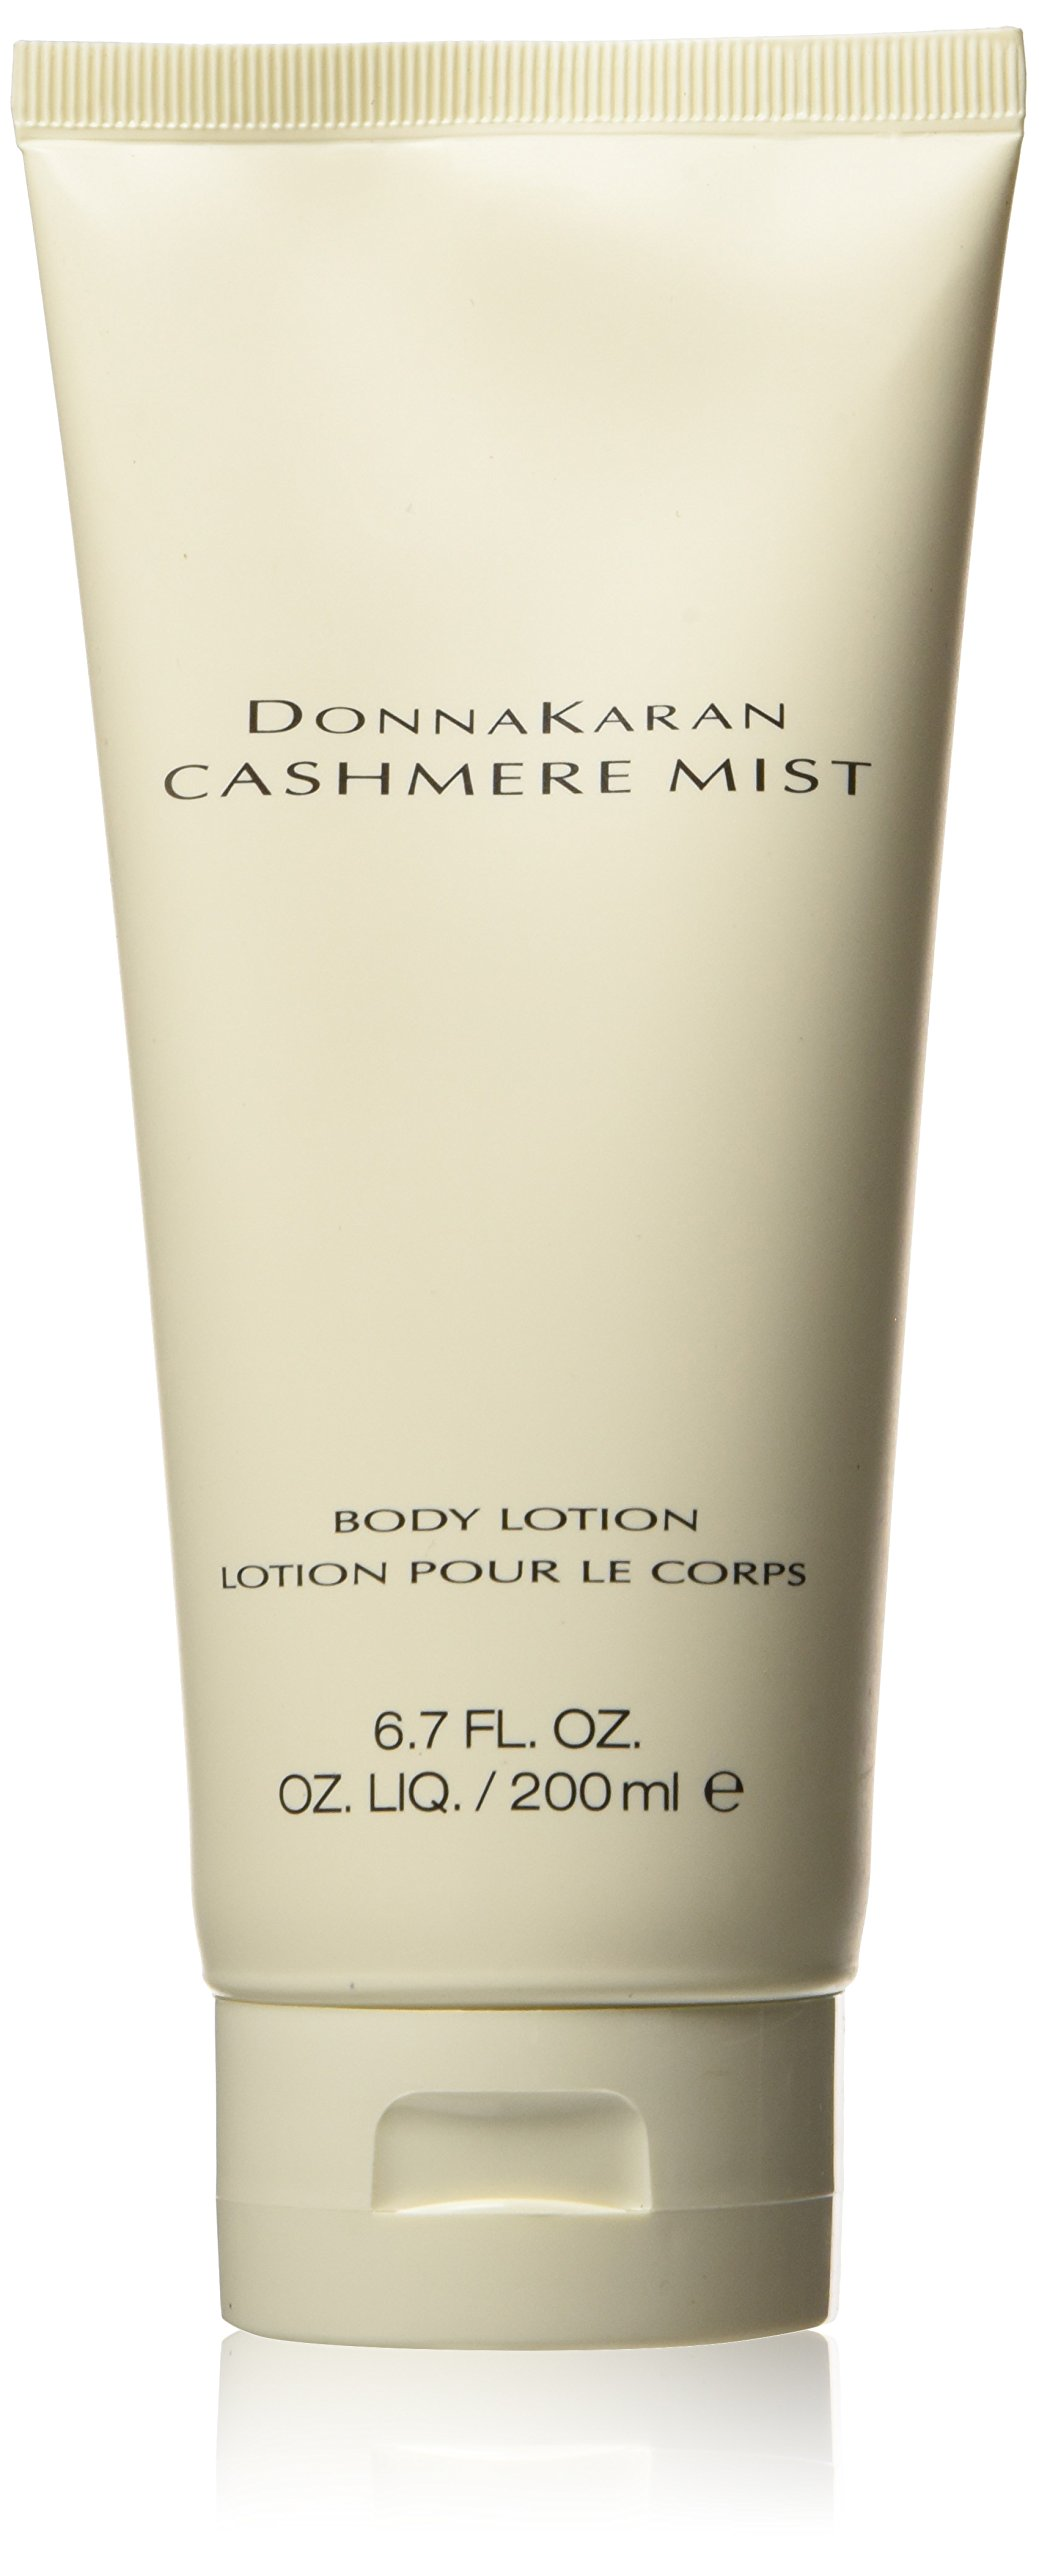 Donna Karan Cashmere Mist Body Lotion for Women, 6.7 Ounce